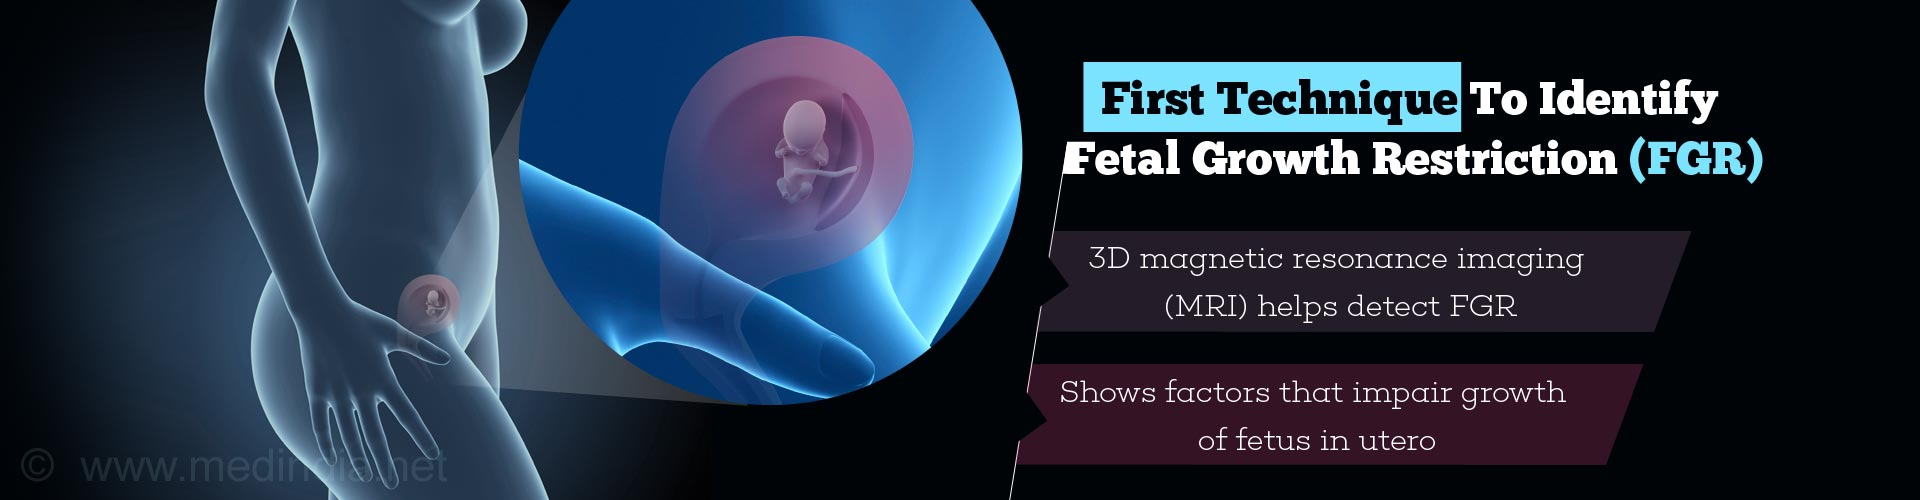 Non-invasive Technique To Identify Fetal Growth Restriction in Uterus